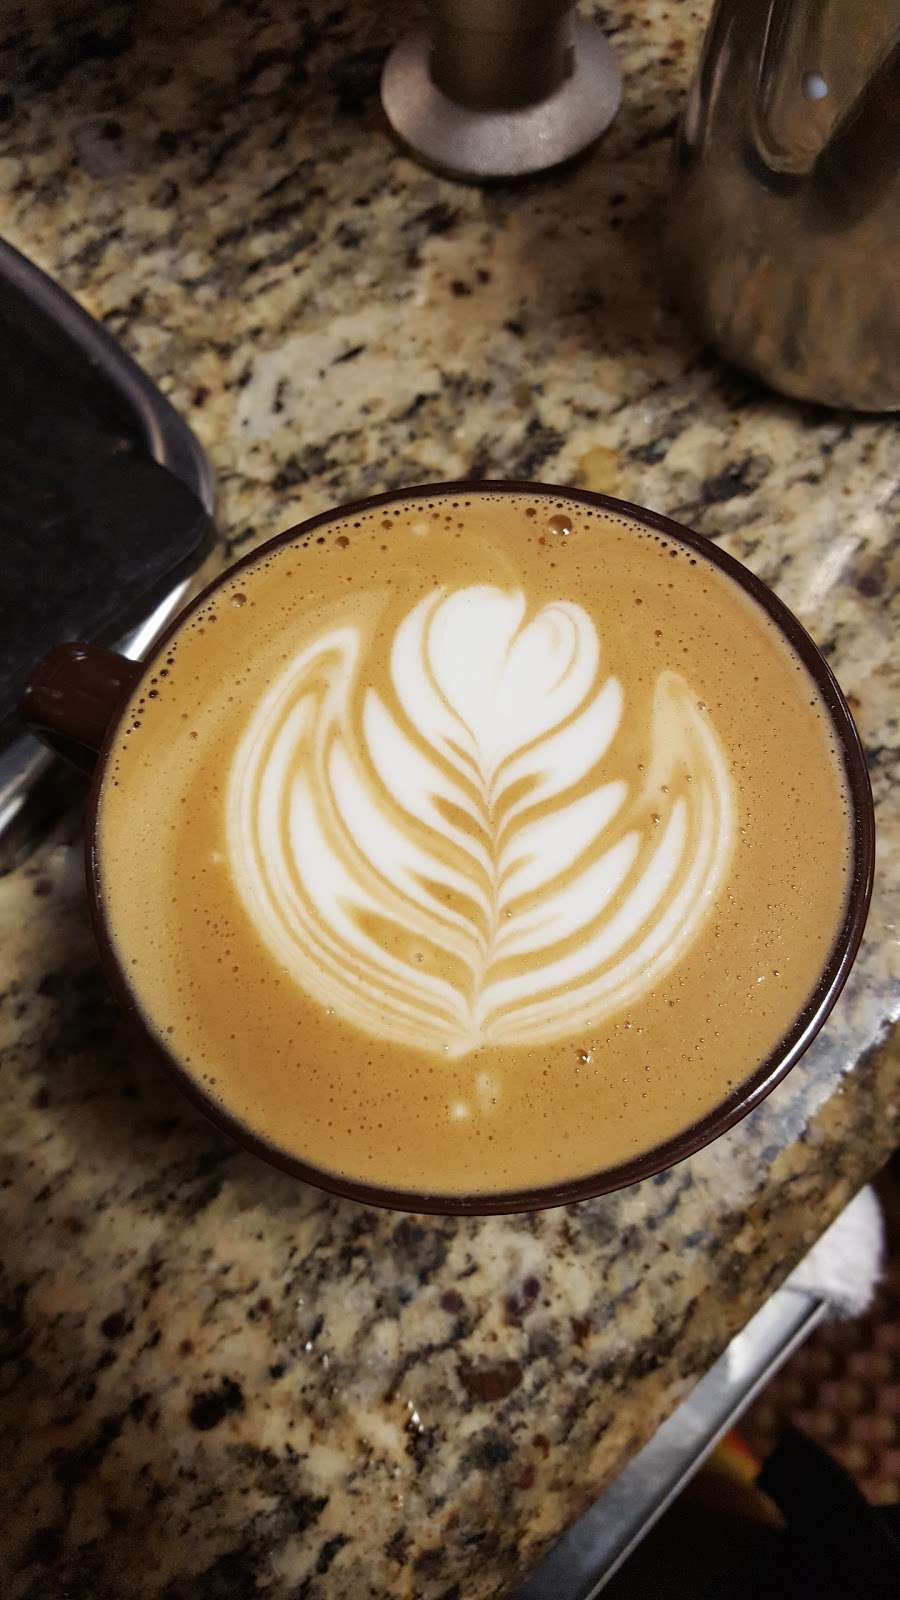 Muir Woods Coffee House - cafe  | Photo 4 of 10 | Address: 9500 Gilman Dr, La Jolla, CA 92093, USA